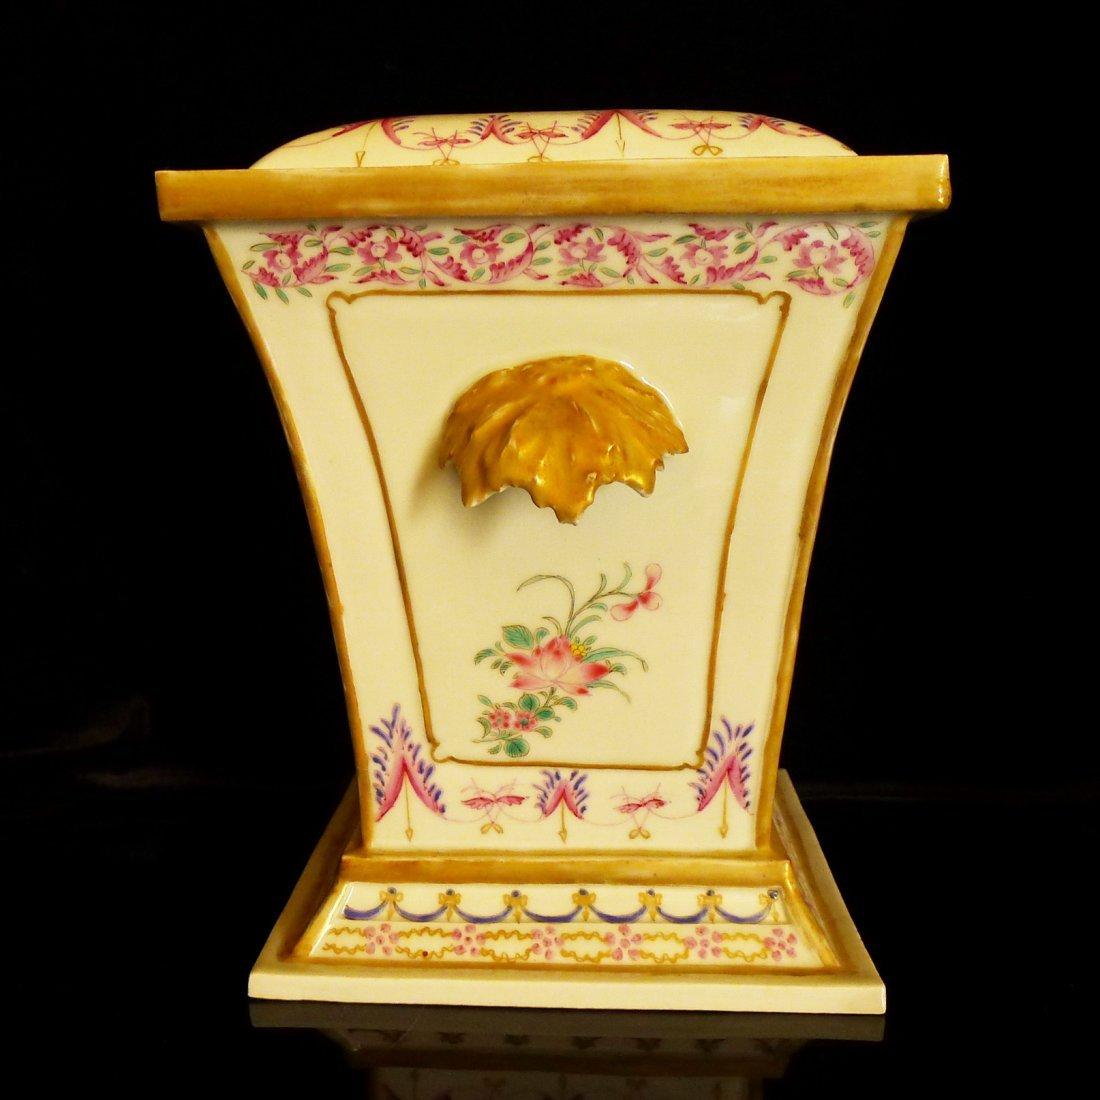 Prar of Chinese export porcelain European heraldry - 6